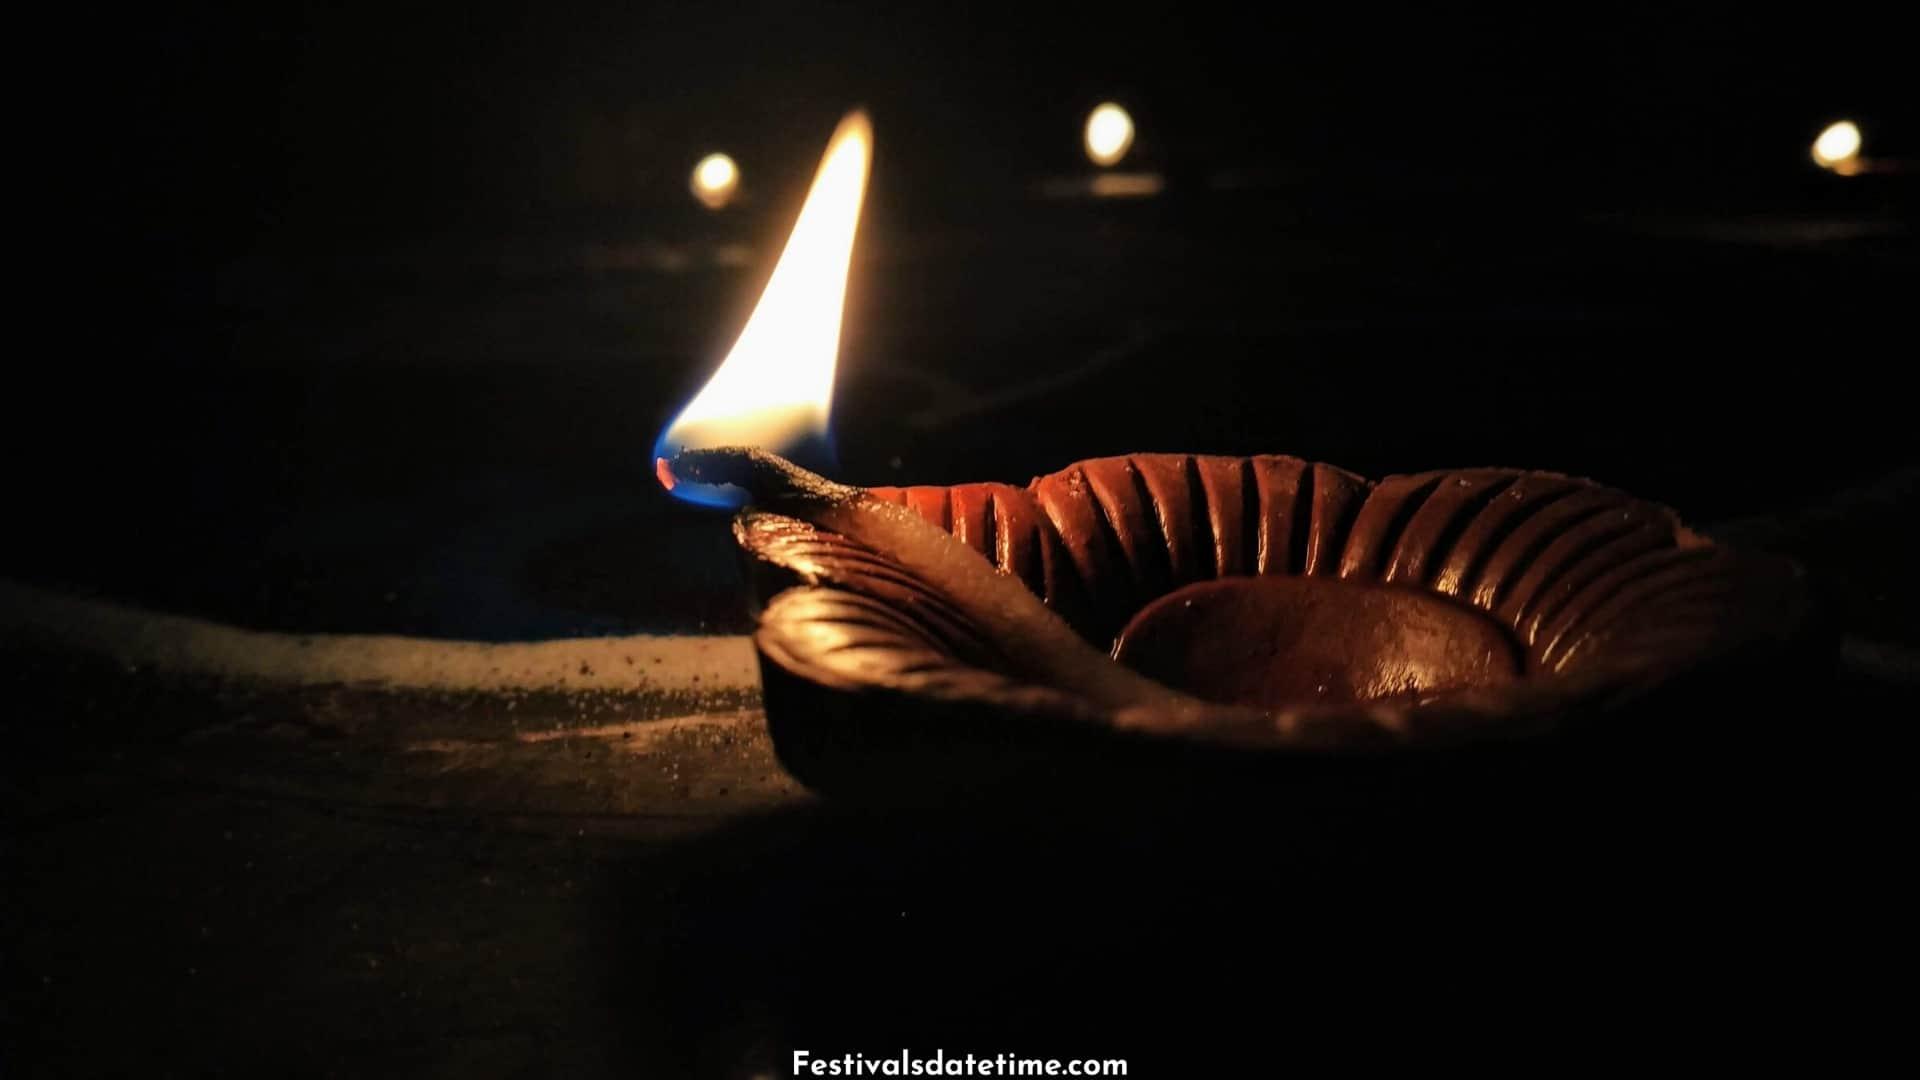 diwali_background_for_editing